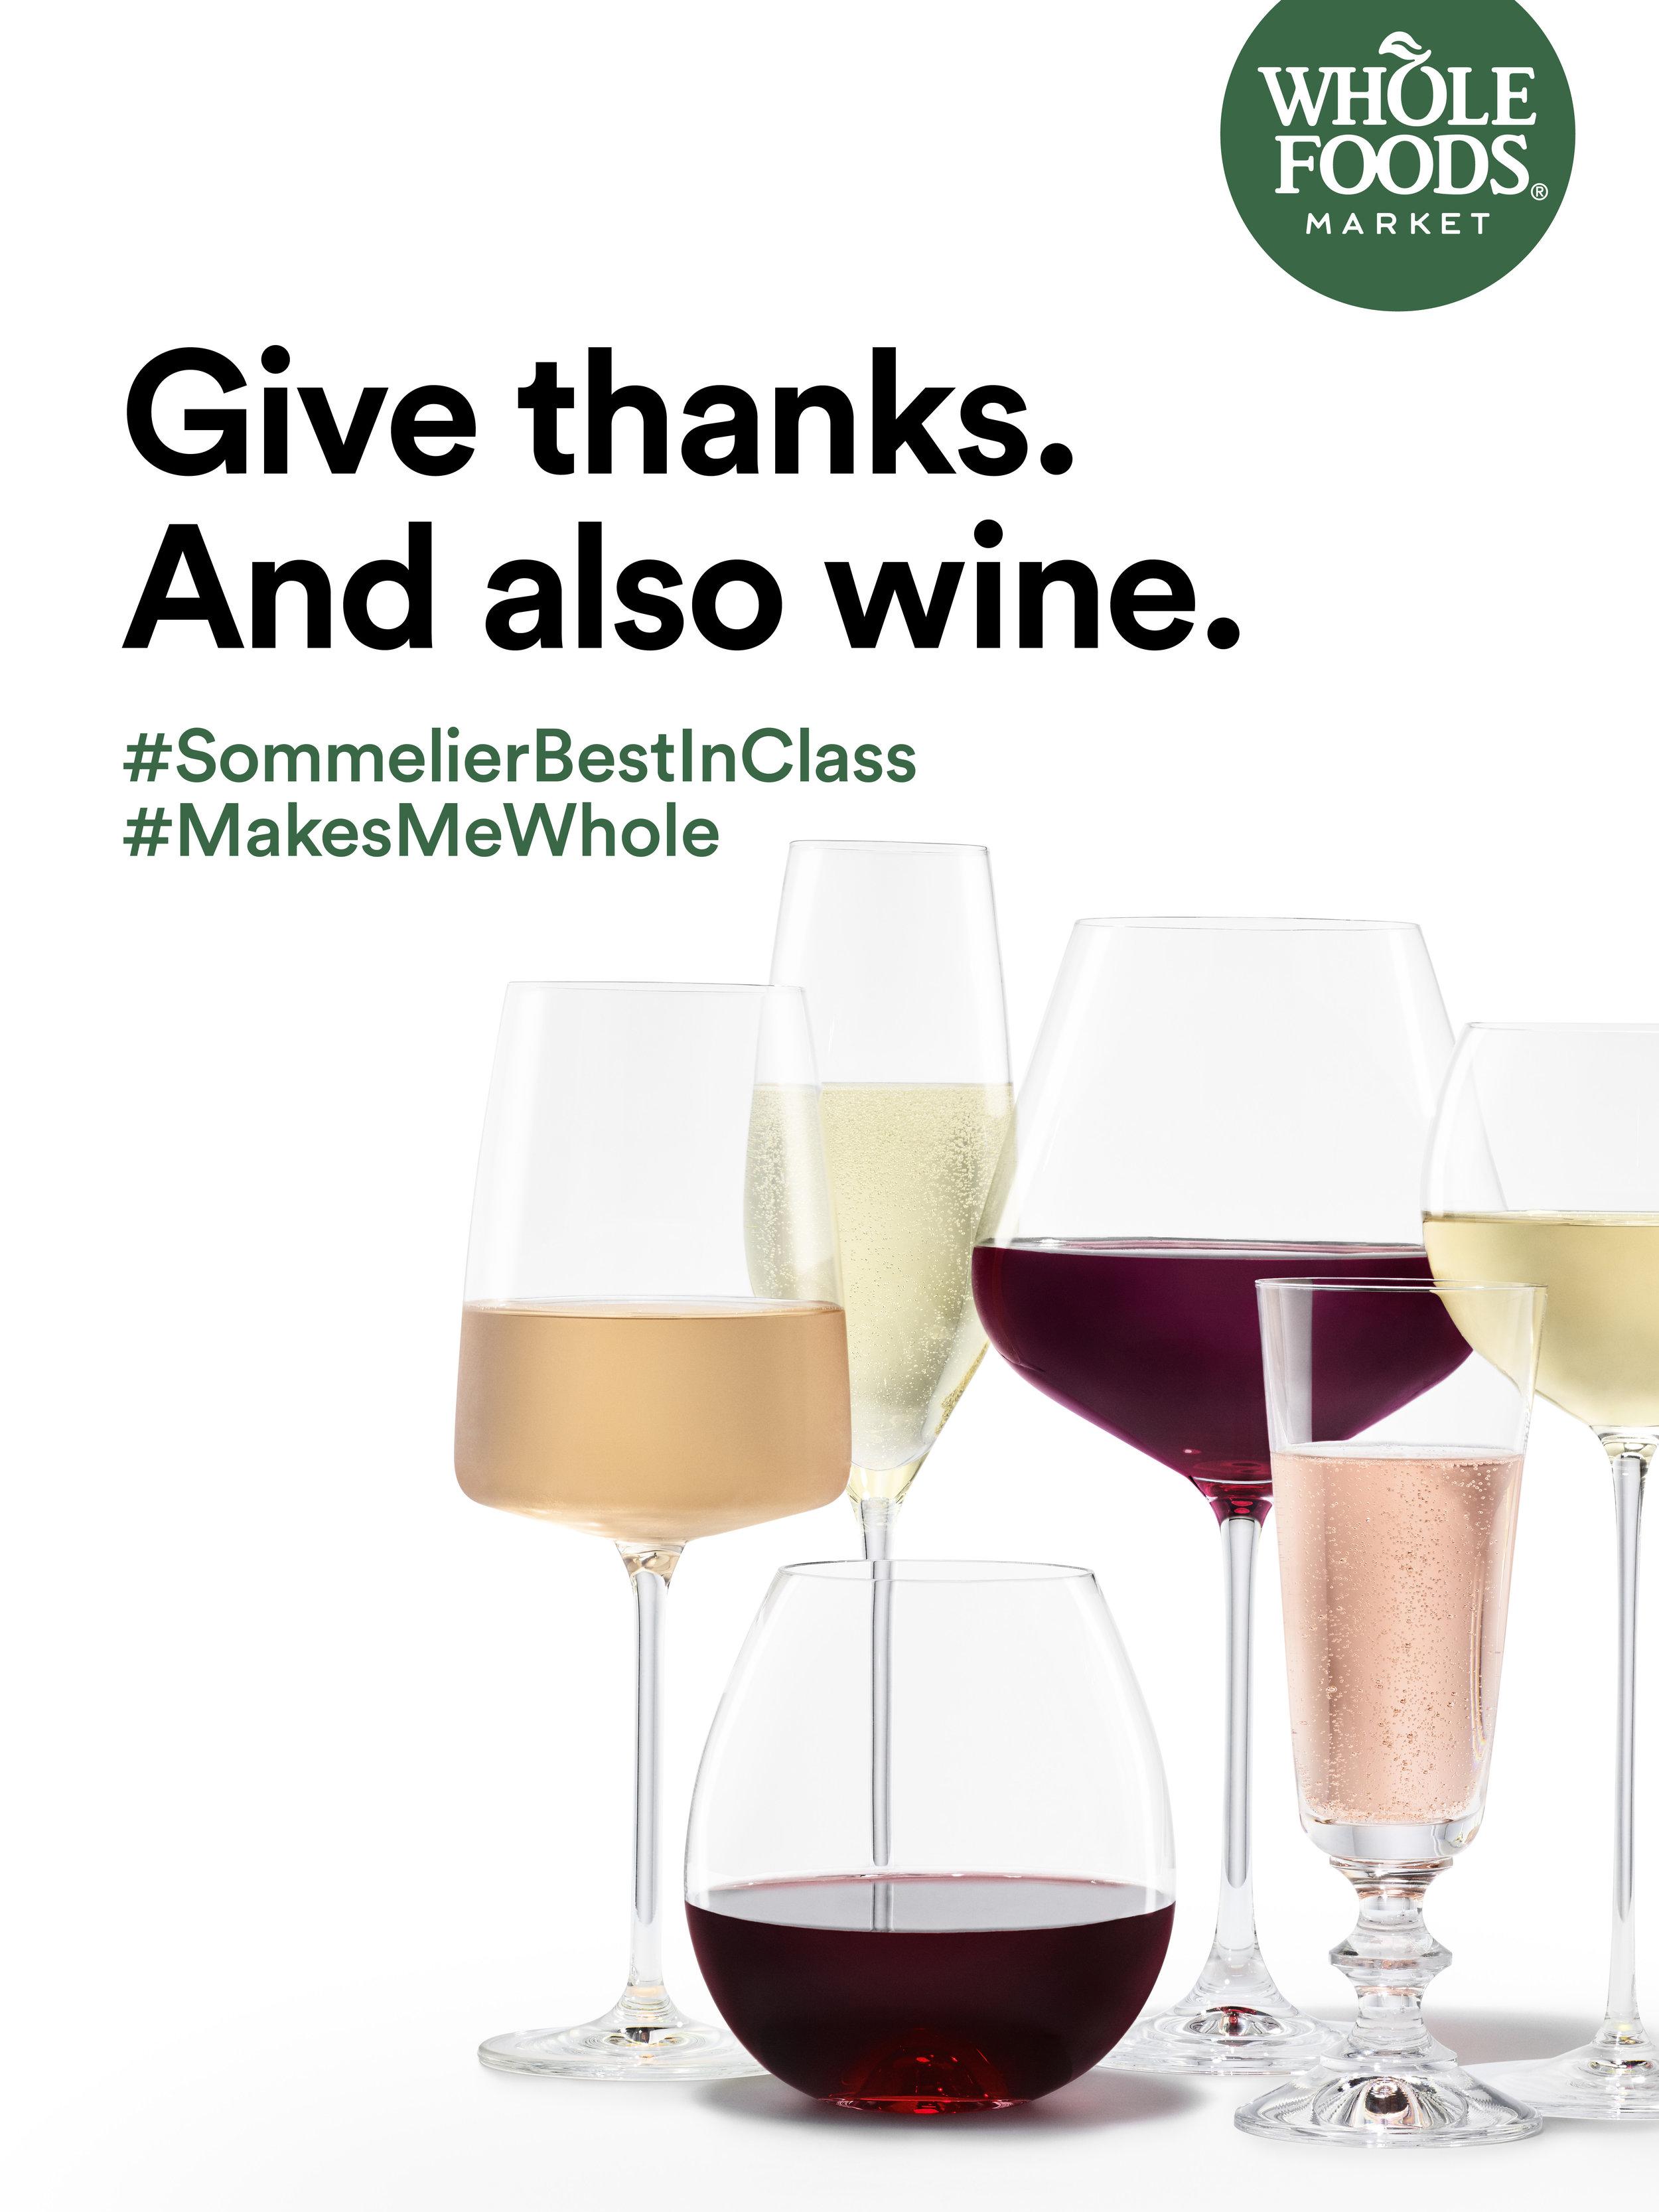 WFM_Harvest_Posters_2018_36x48_Wine.jpg